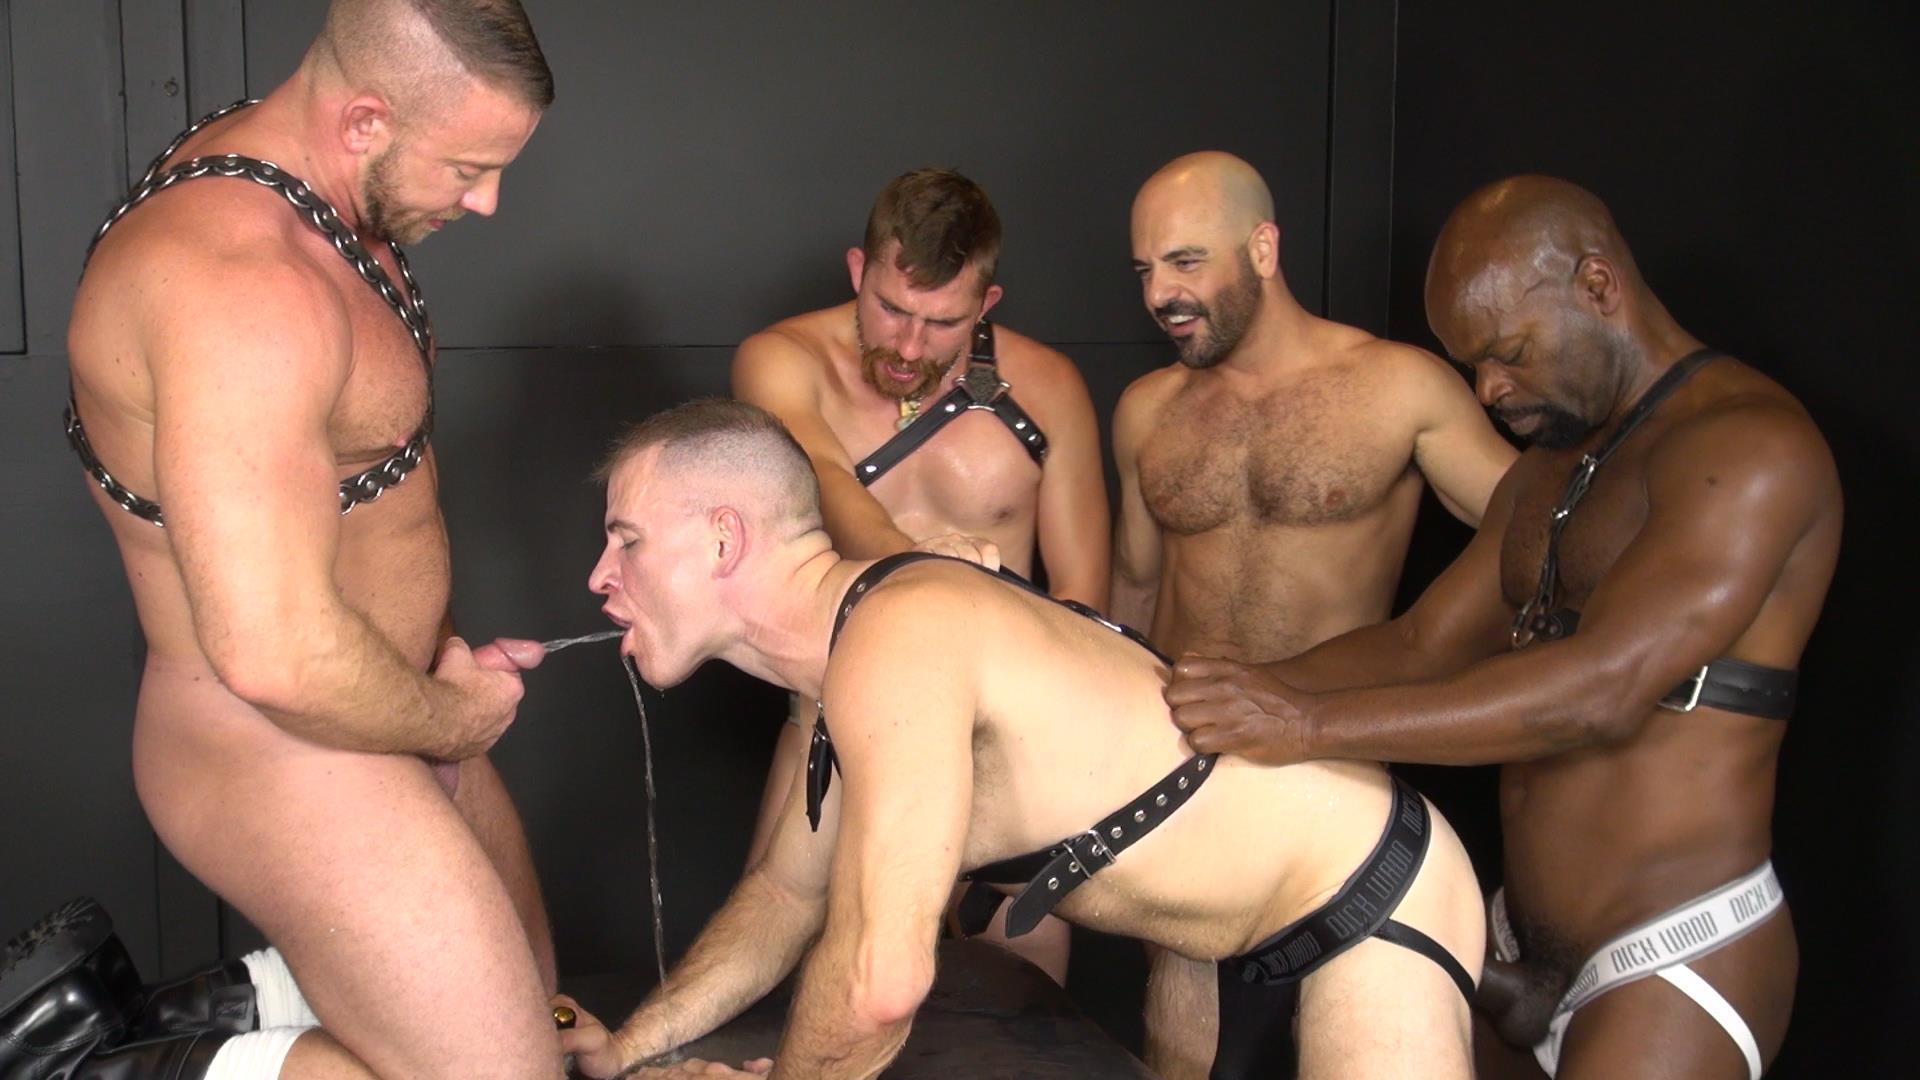 Raw-and-Rough-Ken-Byker-Dayton-OConnor-Trelino-Shay-Michaels-Adam-Russo-Cutler-X-Interracial-Bareback-Orgy-Amateur-Gay-Porn-05 Interracial Bareback Orgy With Adam Russo & Cutler X